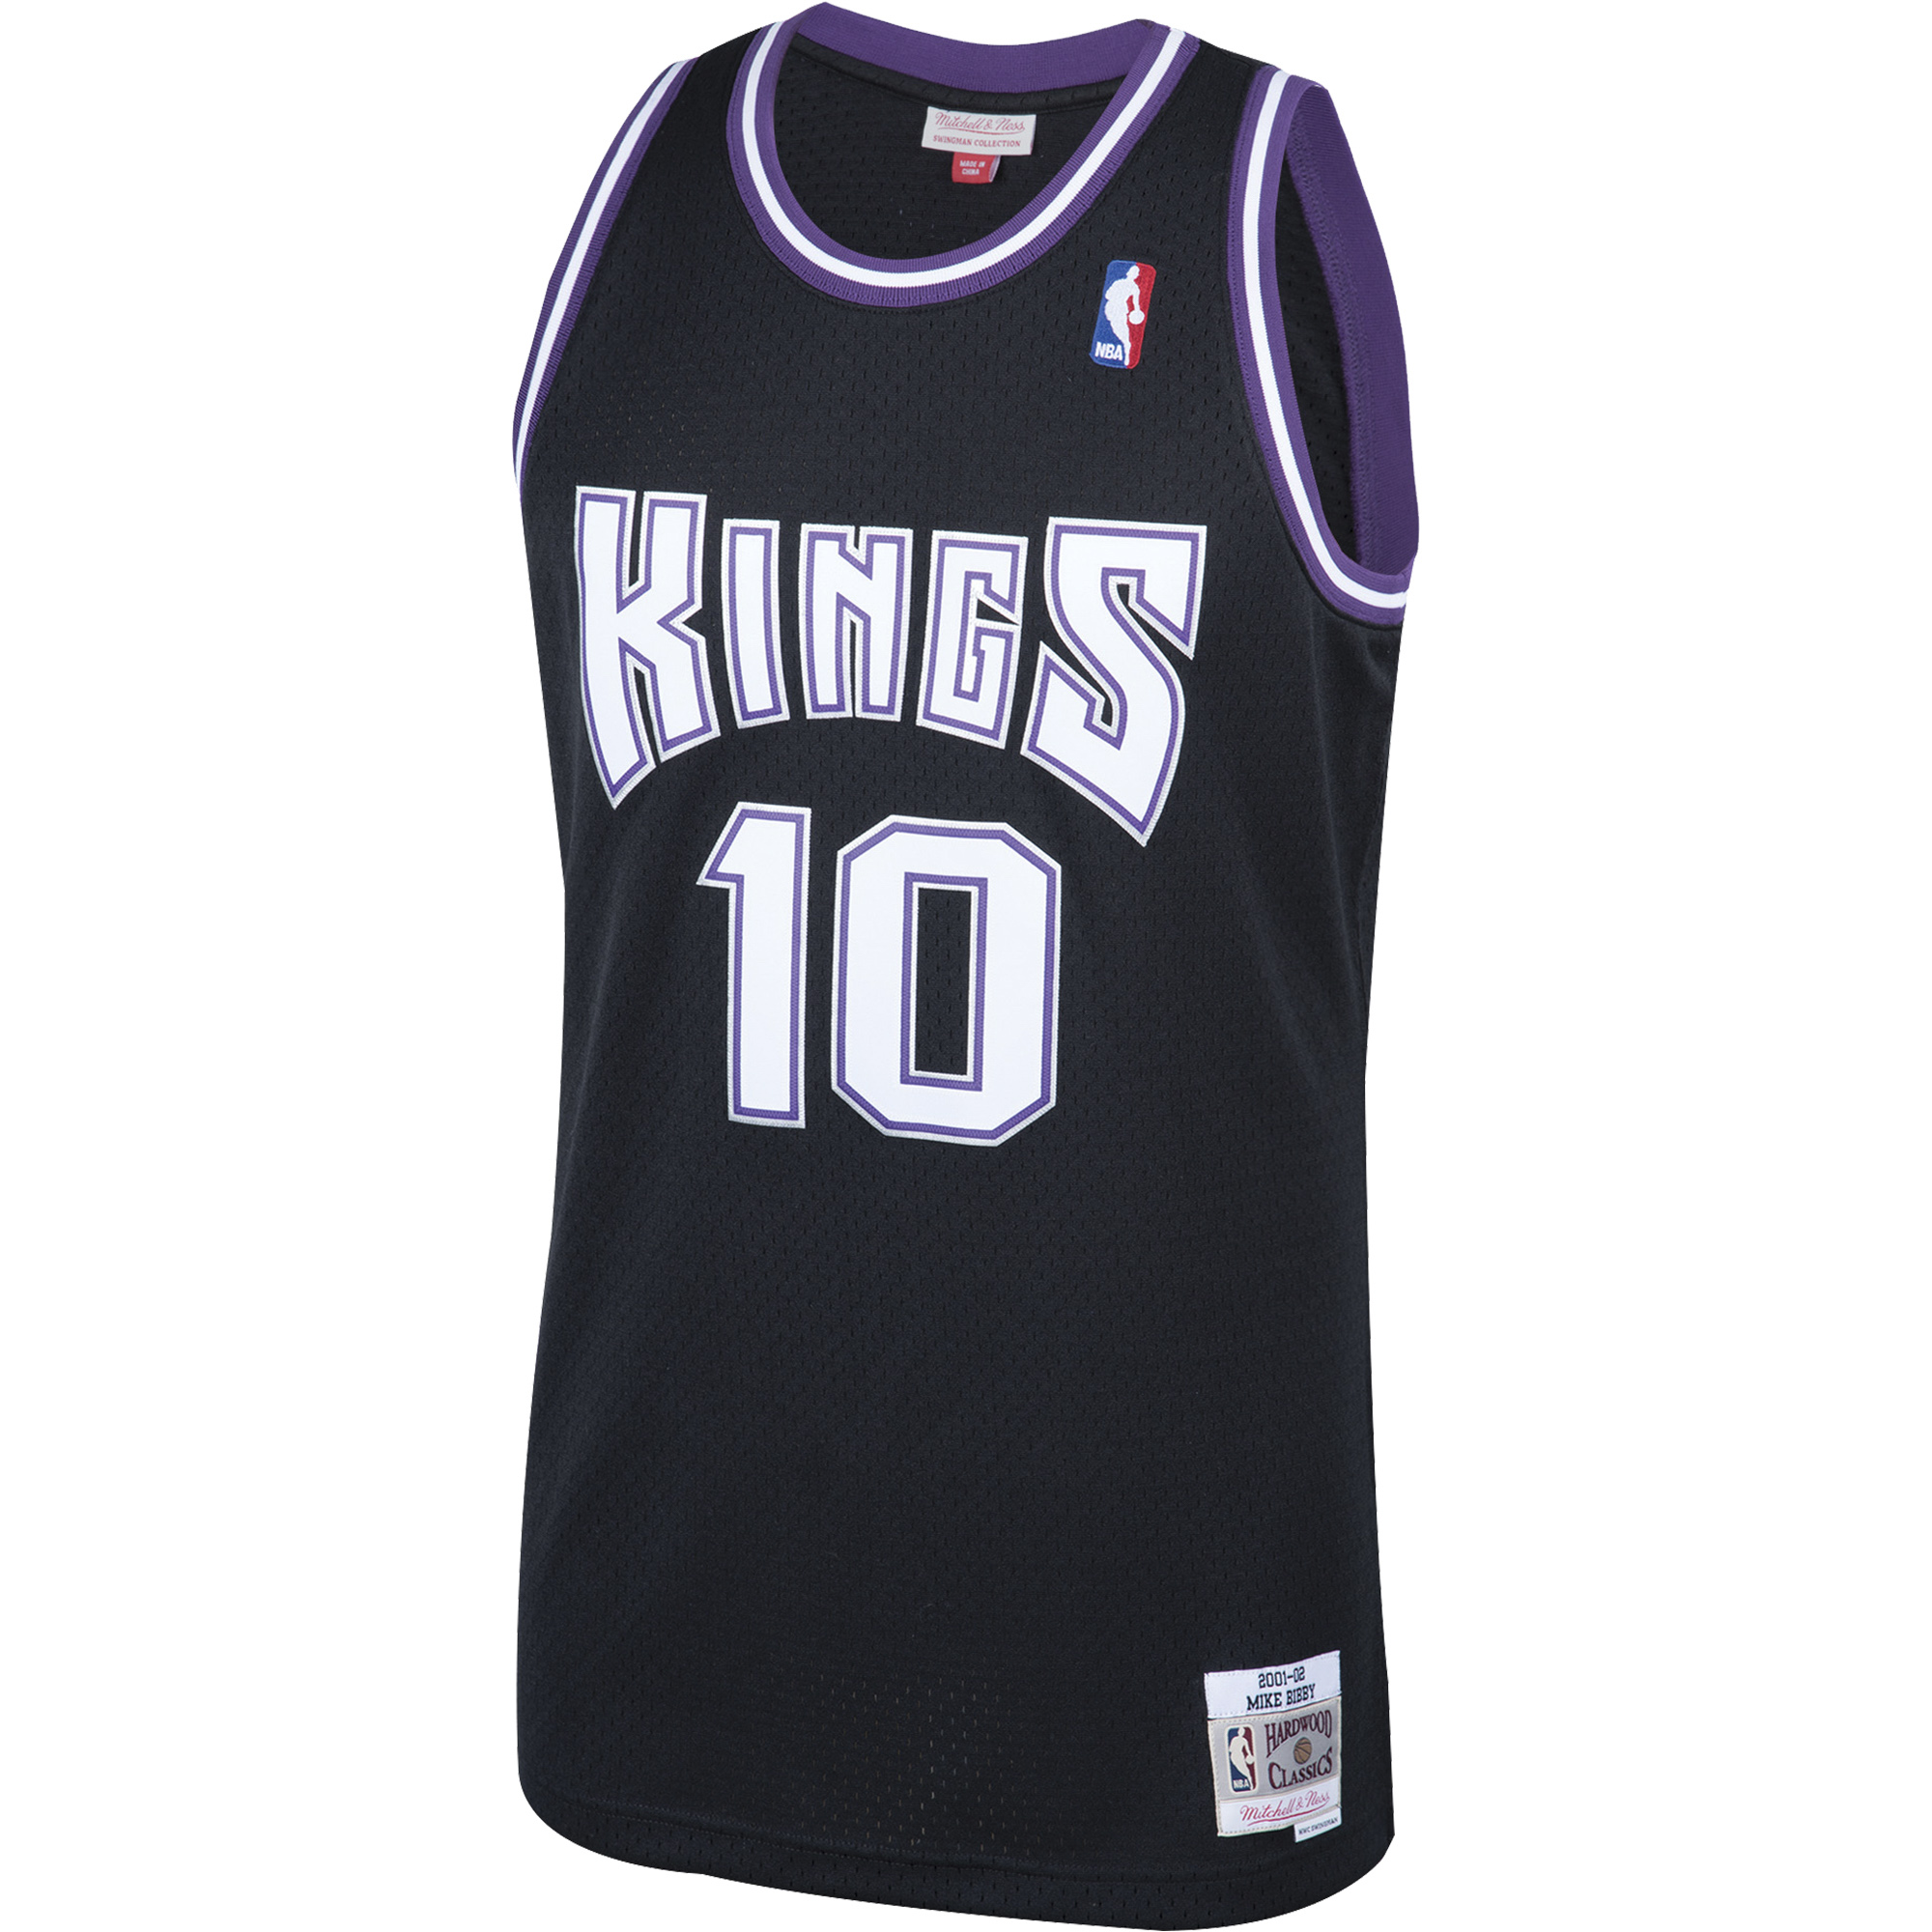 1b16188f1 Mike Bibby Sacramento Kings Mitchell   Ness 2001-02 Hardwood Classics  Swingman Jersey - Black - Walmart.com